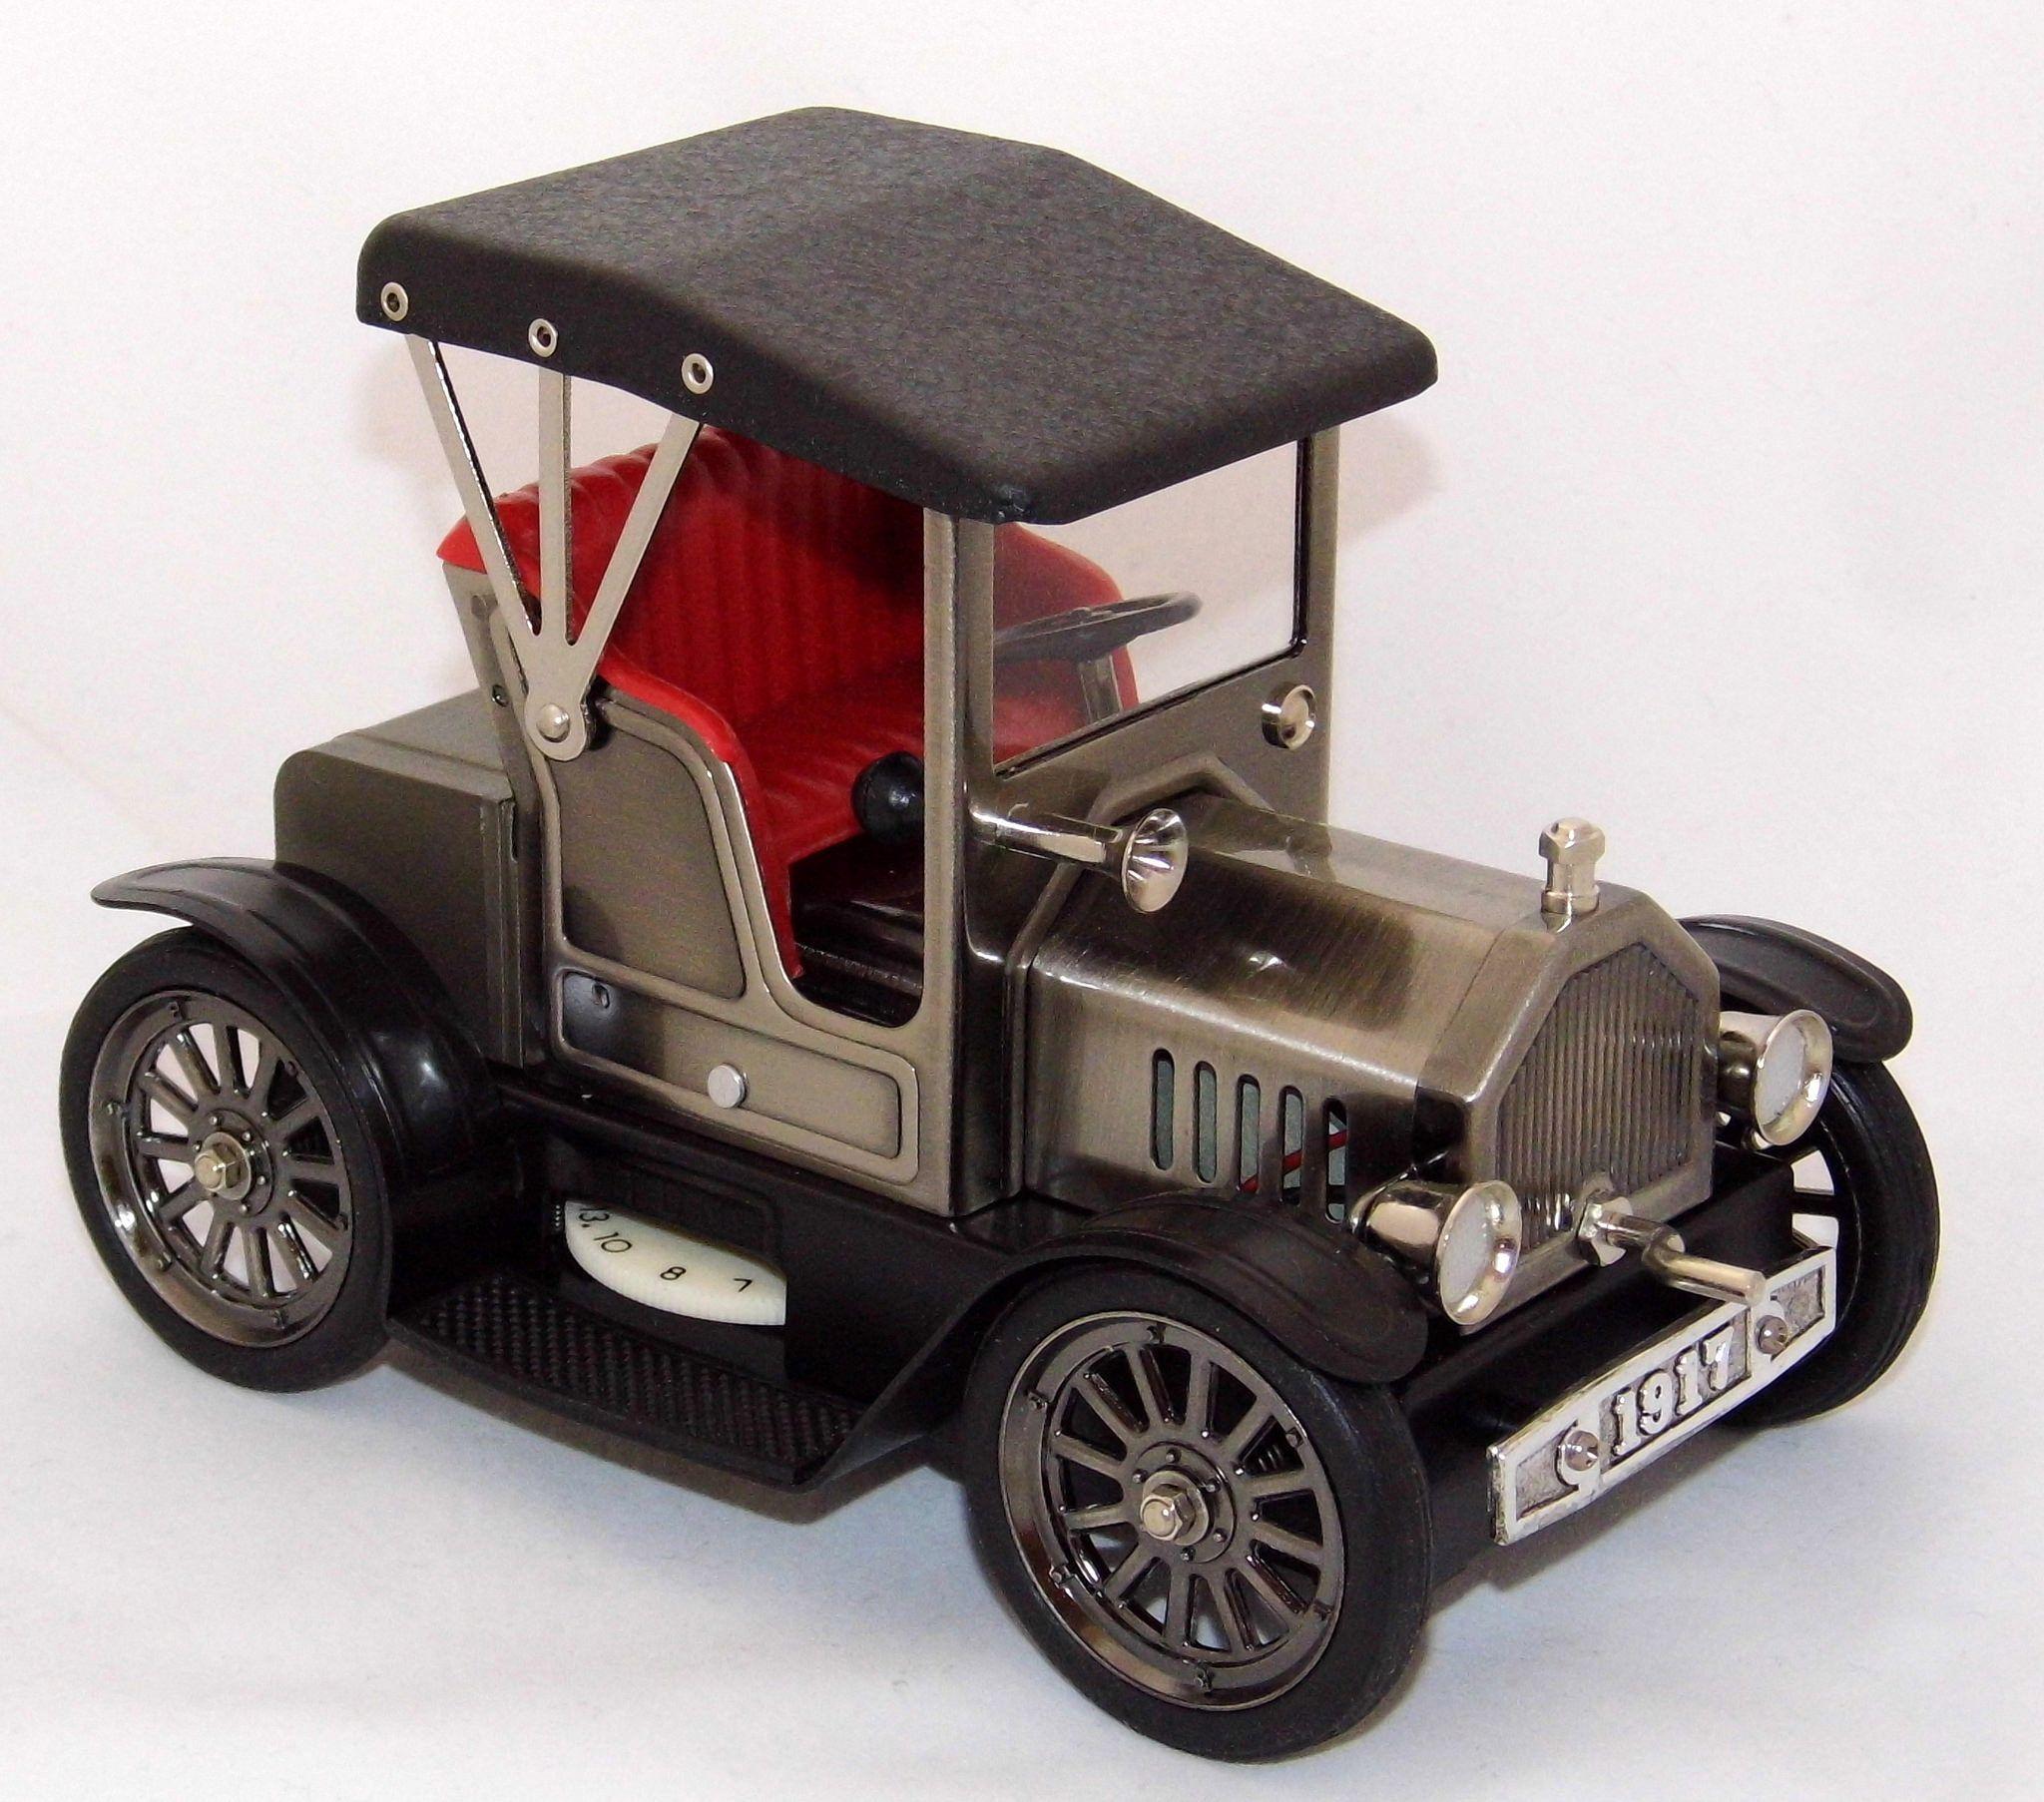 Vintage Antique Car Novelty Transistor Radio, Model TN619